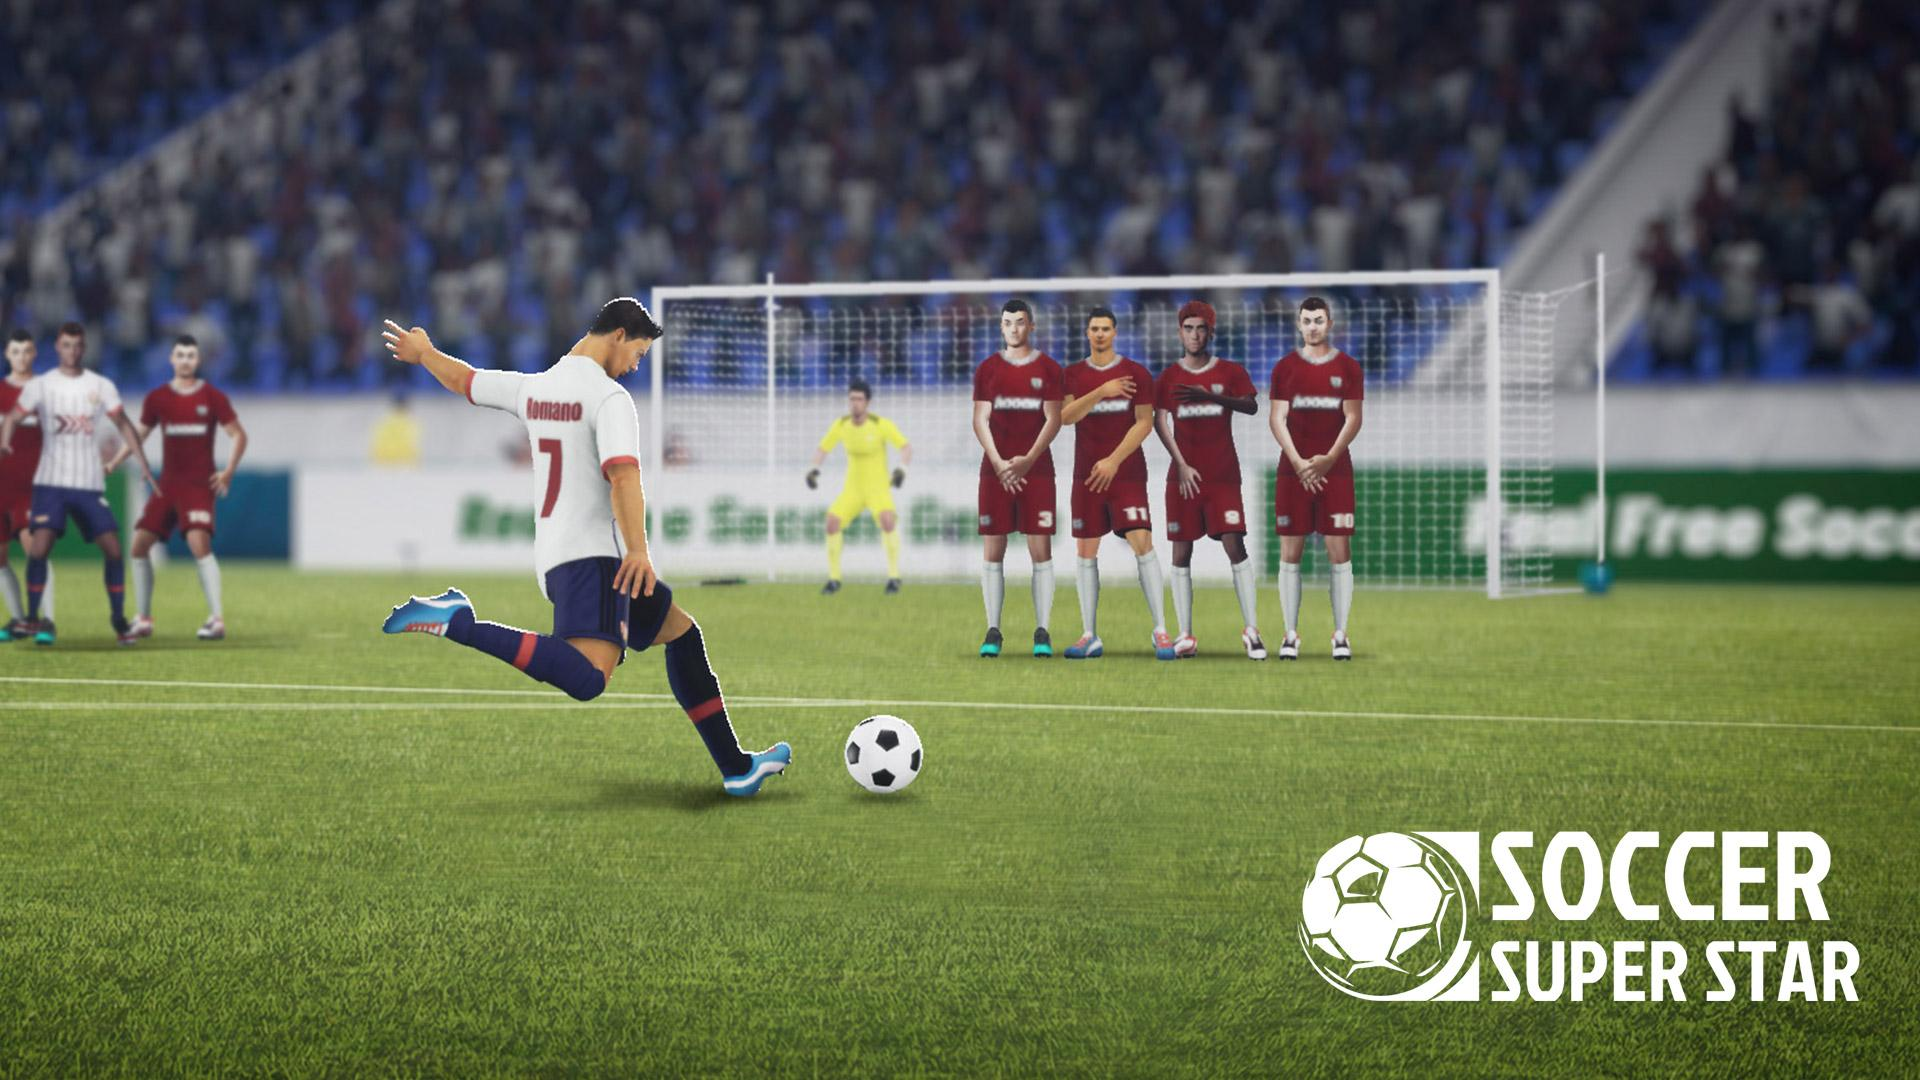 Soccer Super Star - كره القدم